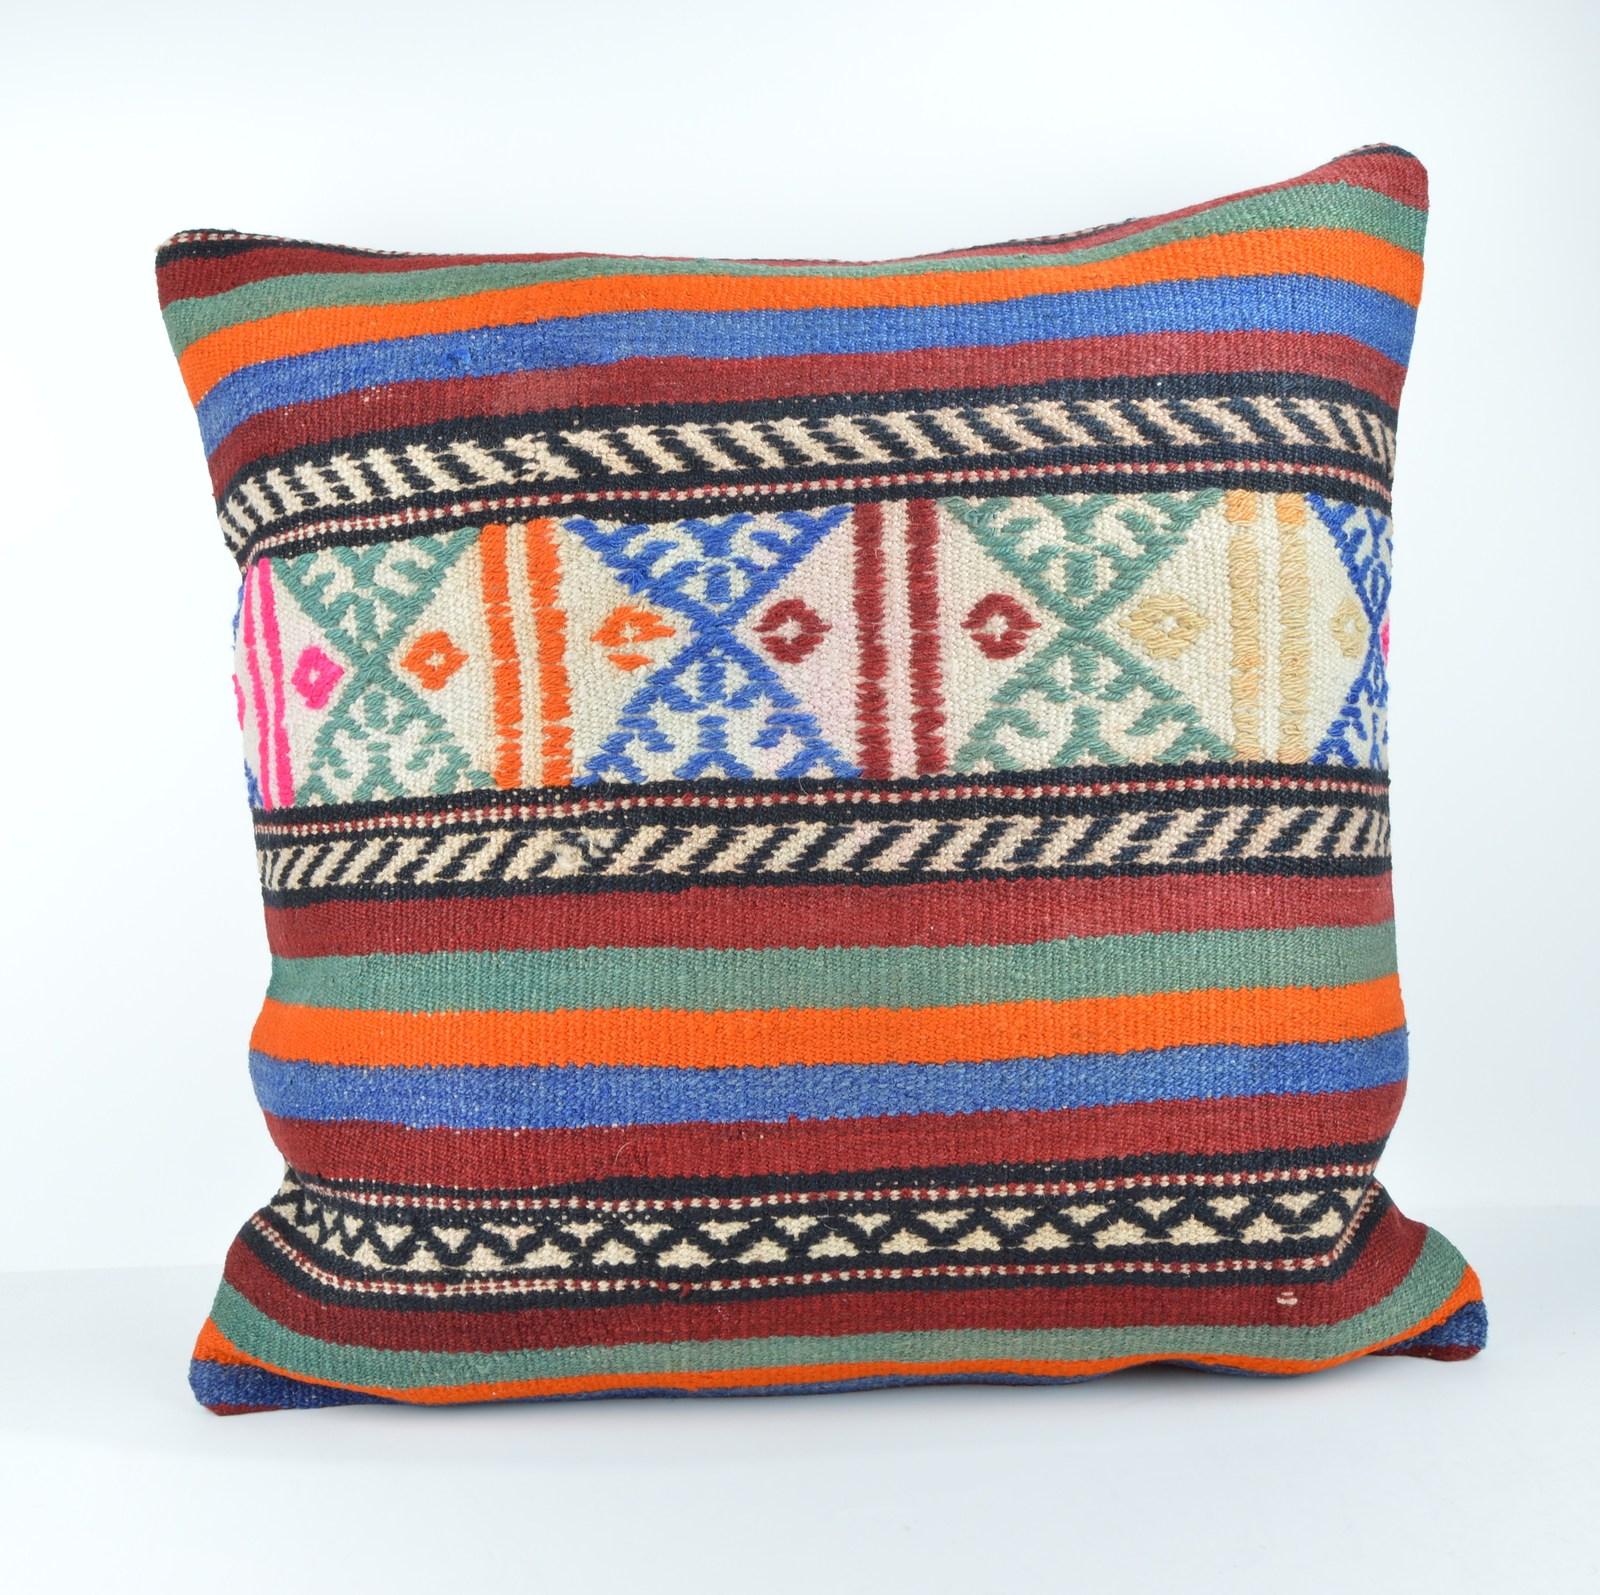 24x24 large pillow big pillow decorative pillow case large cushion 60x60cm - Pillows